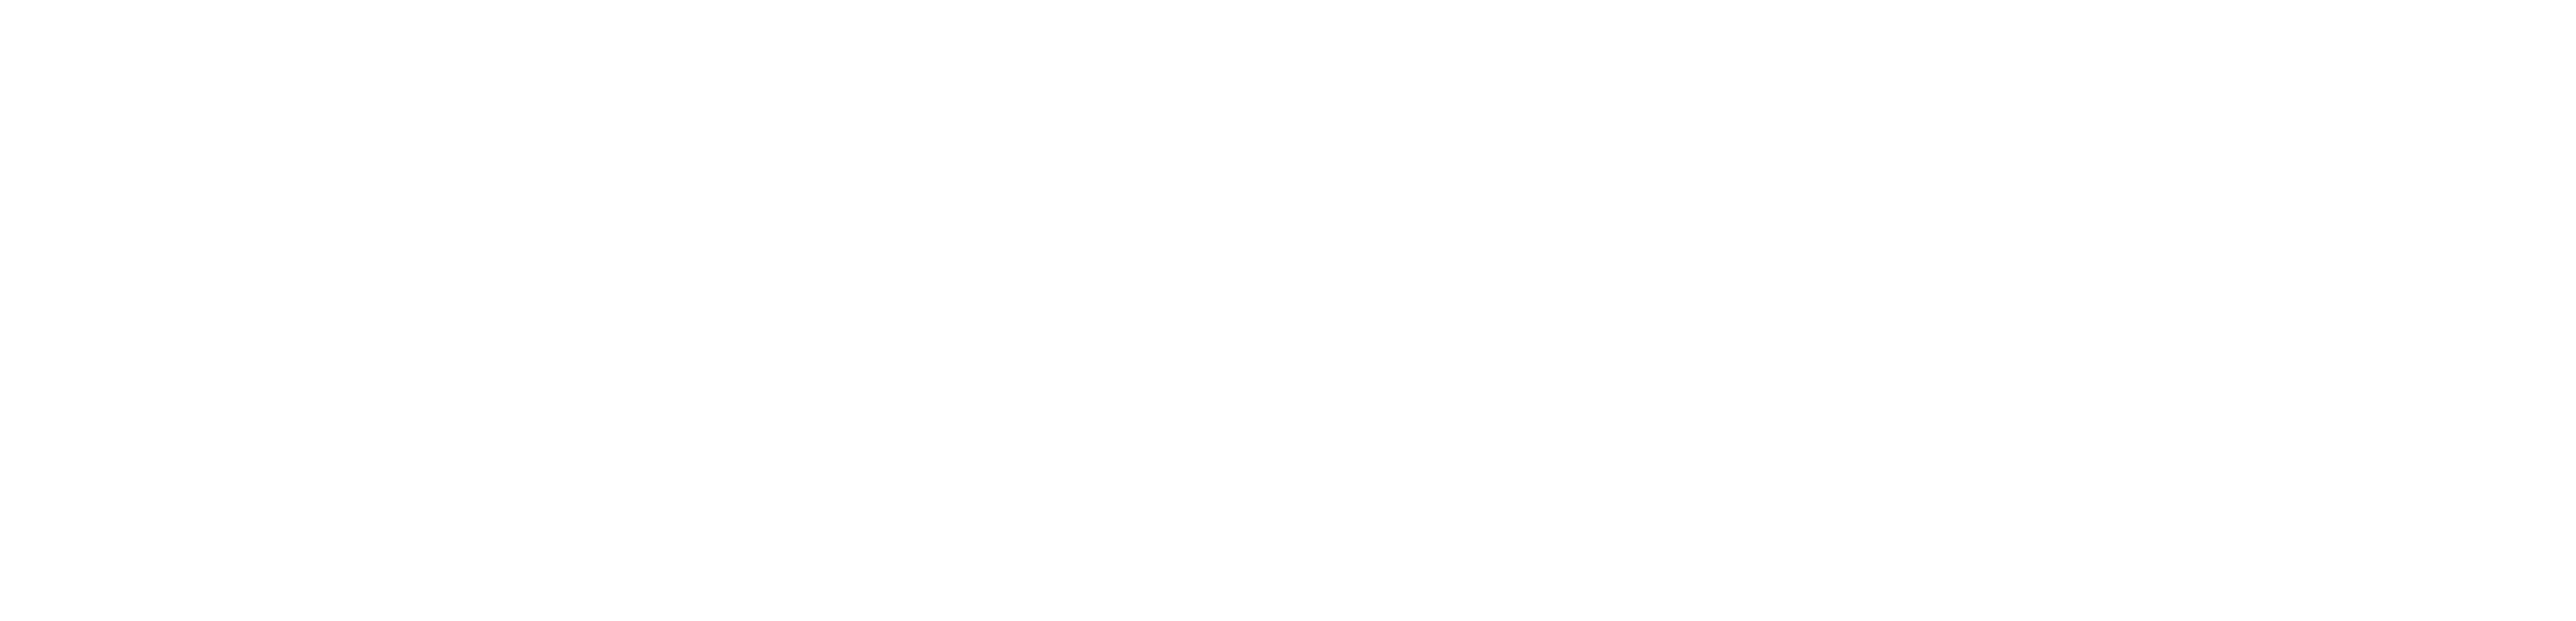 Rapidmarin_logo_white_h-res